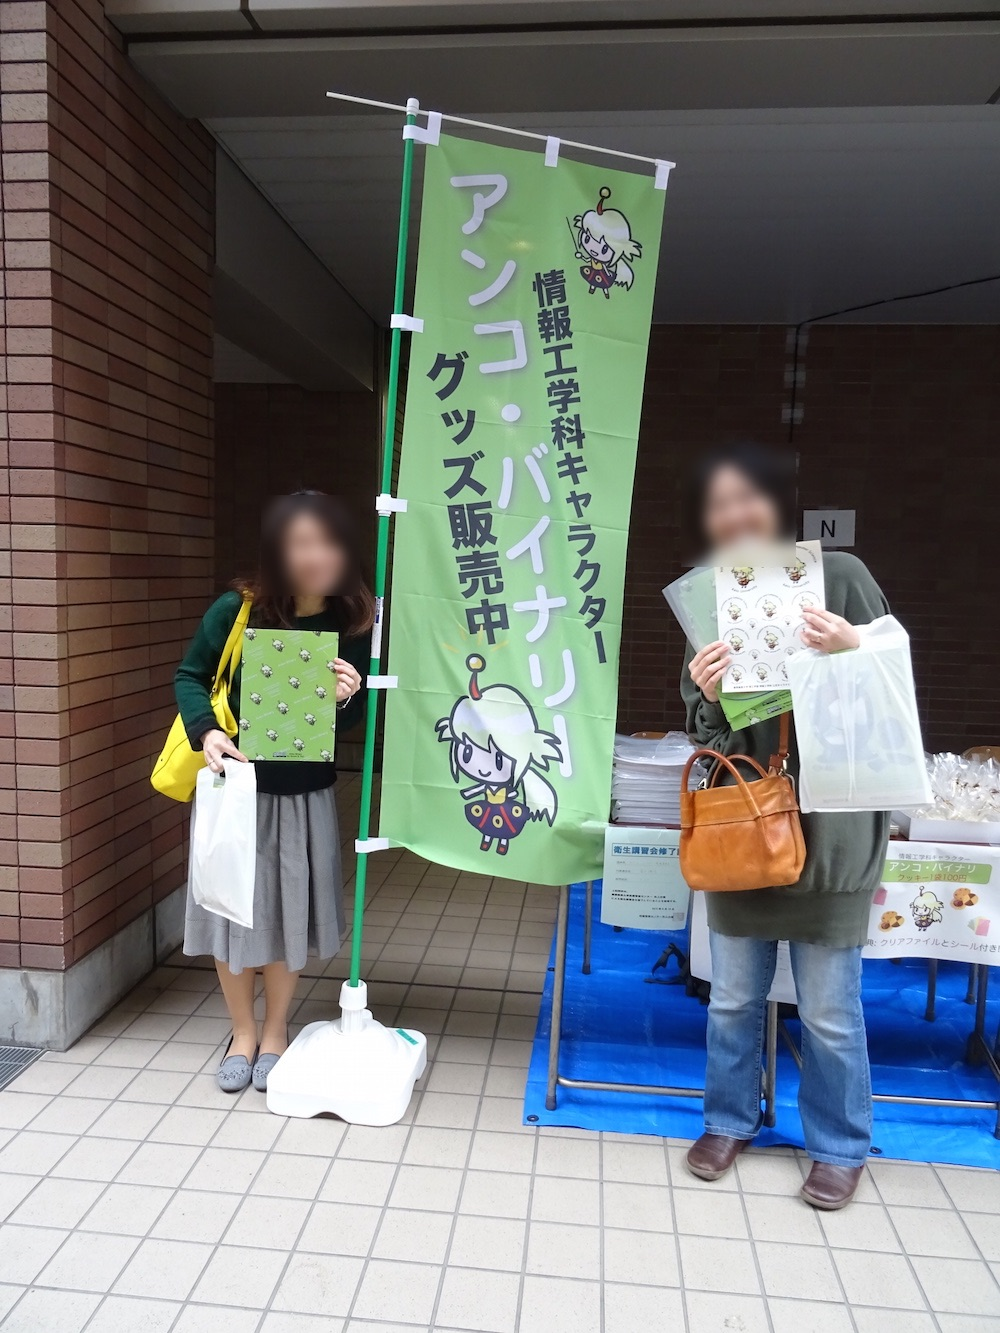 yagami_fes_anko_authors2